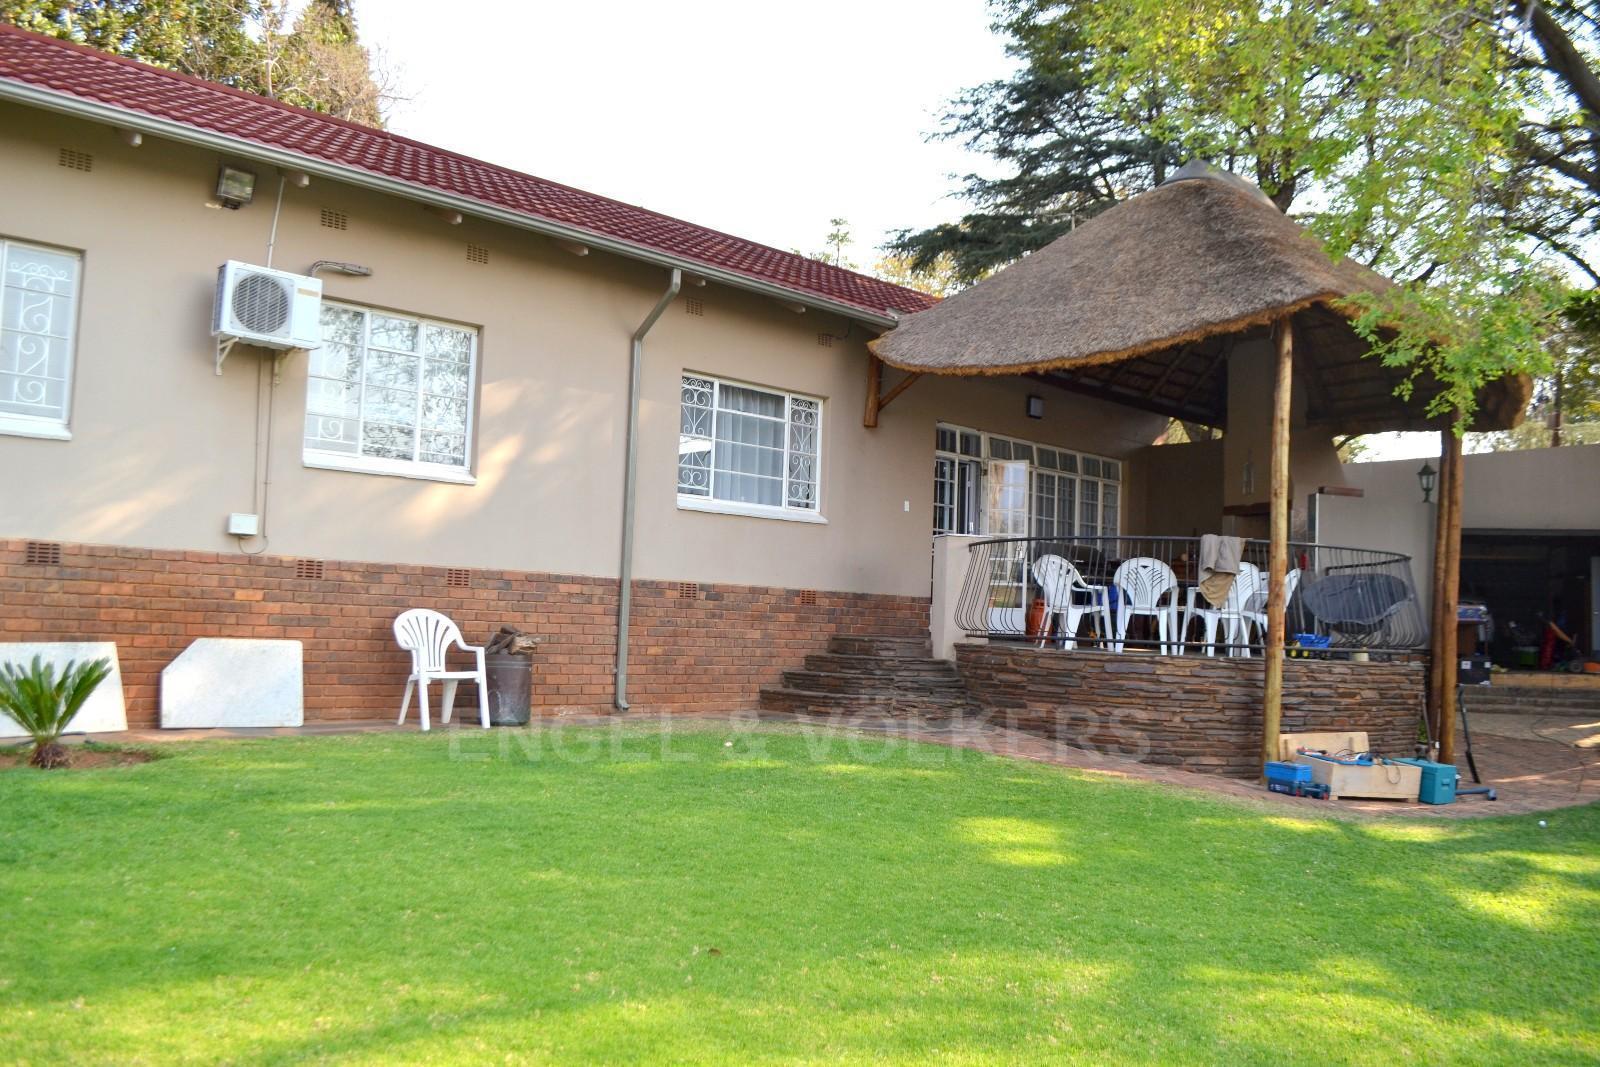 Pretoria groenkloof property houses for sale groenkloof for Landscaping rocks for sale in pretoria